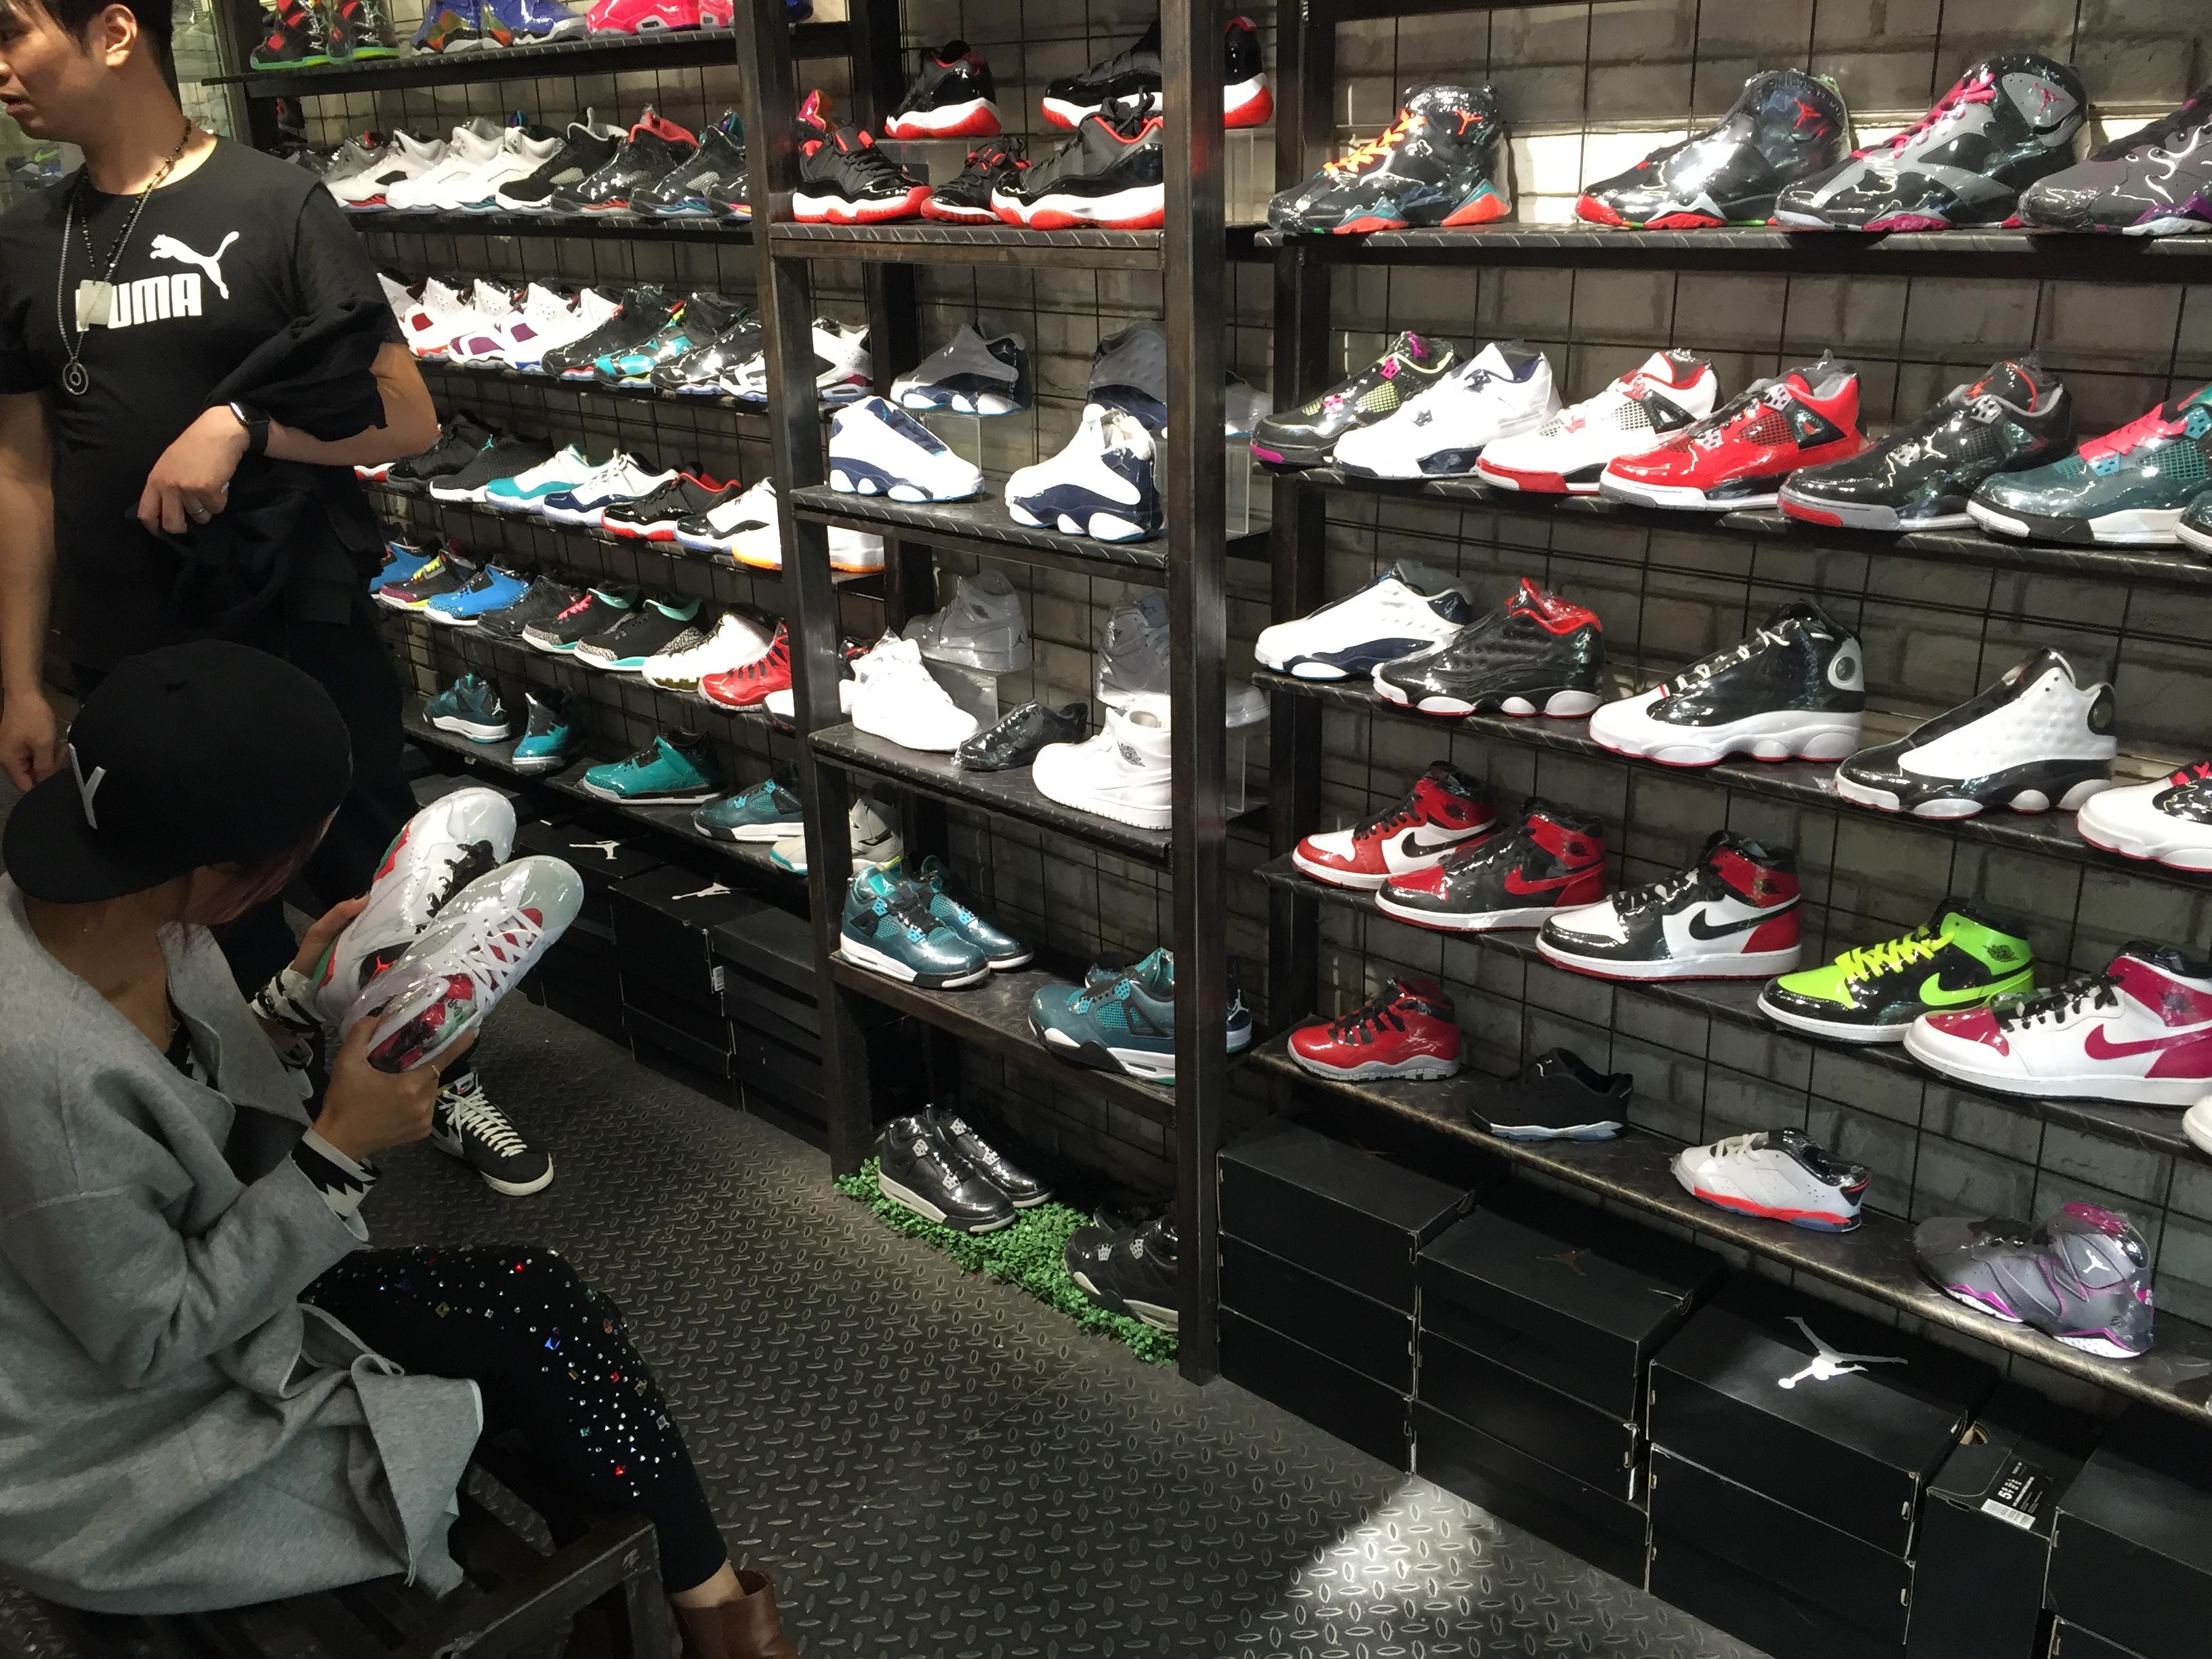 official jordan shoe website